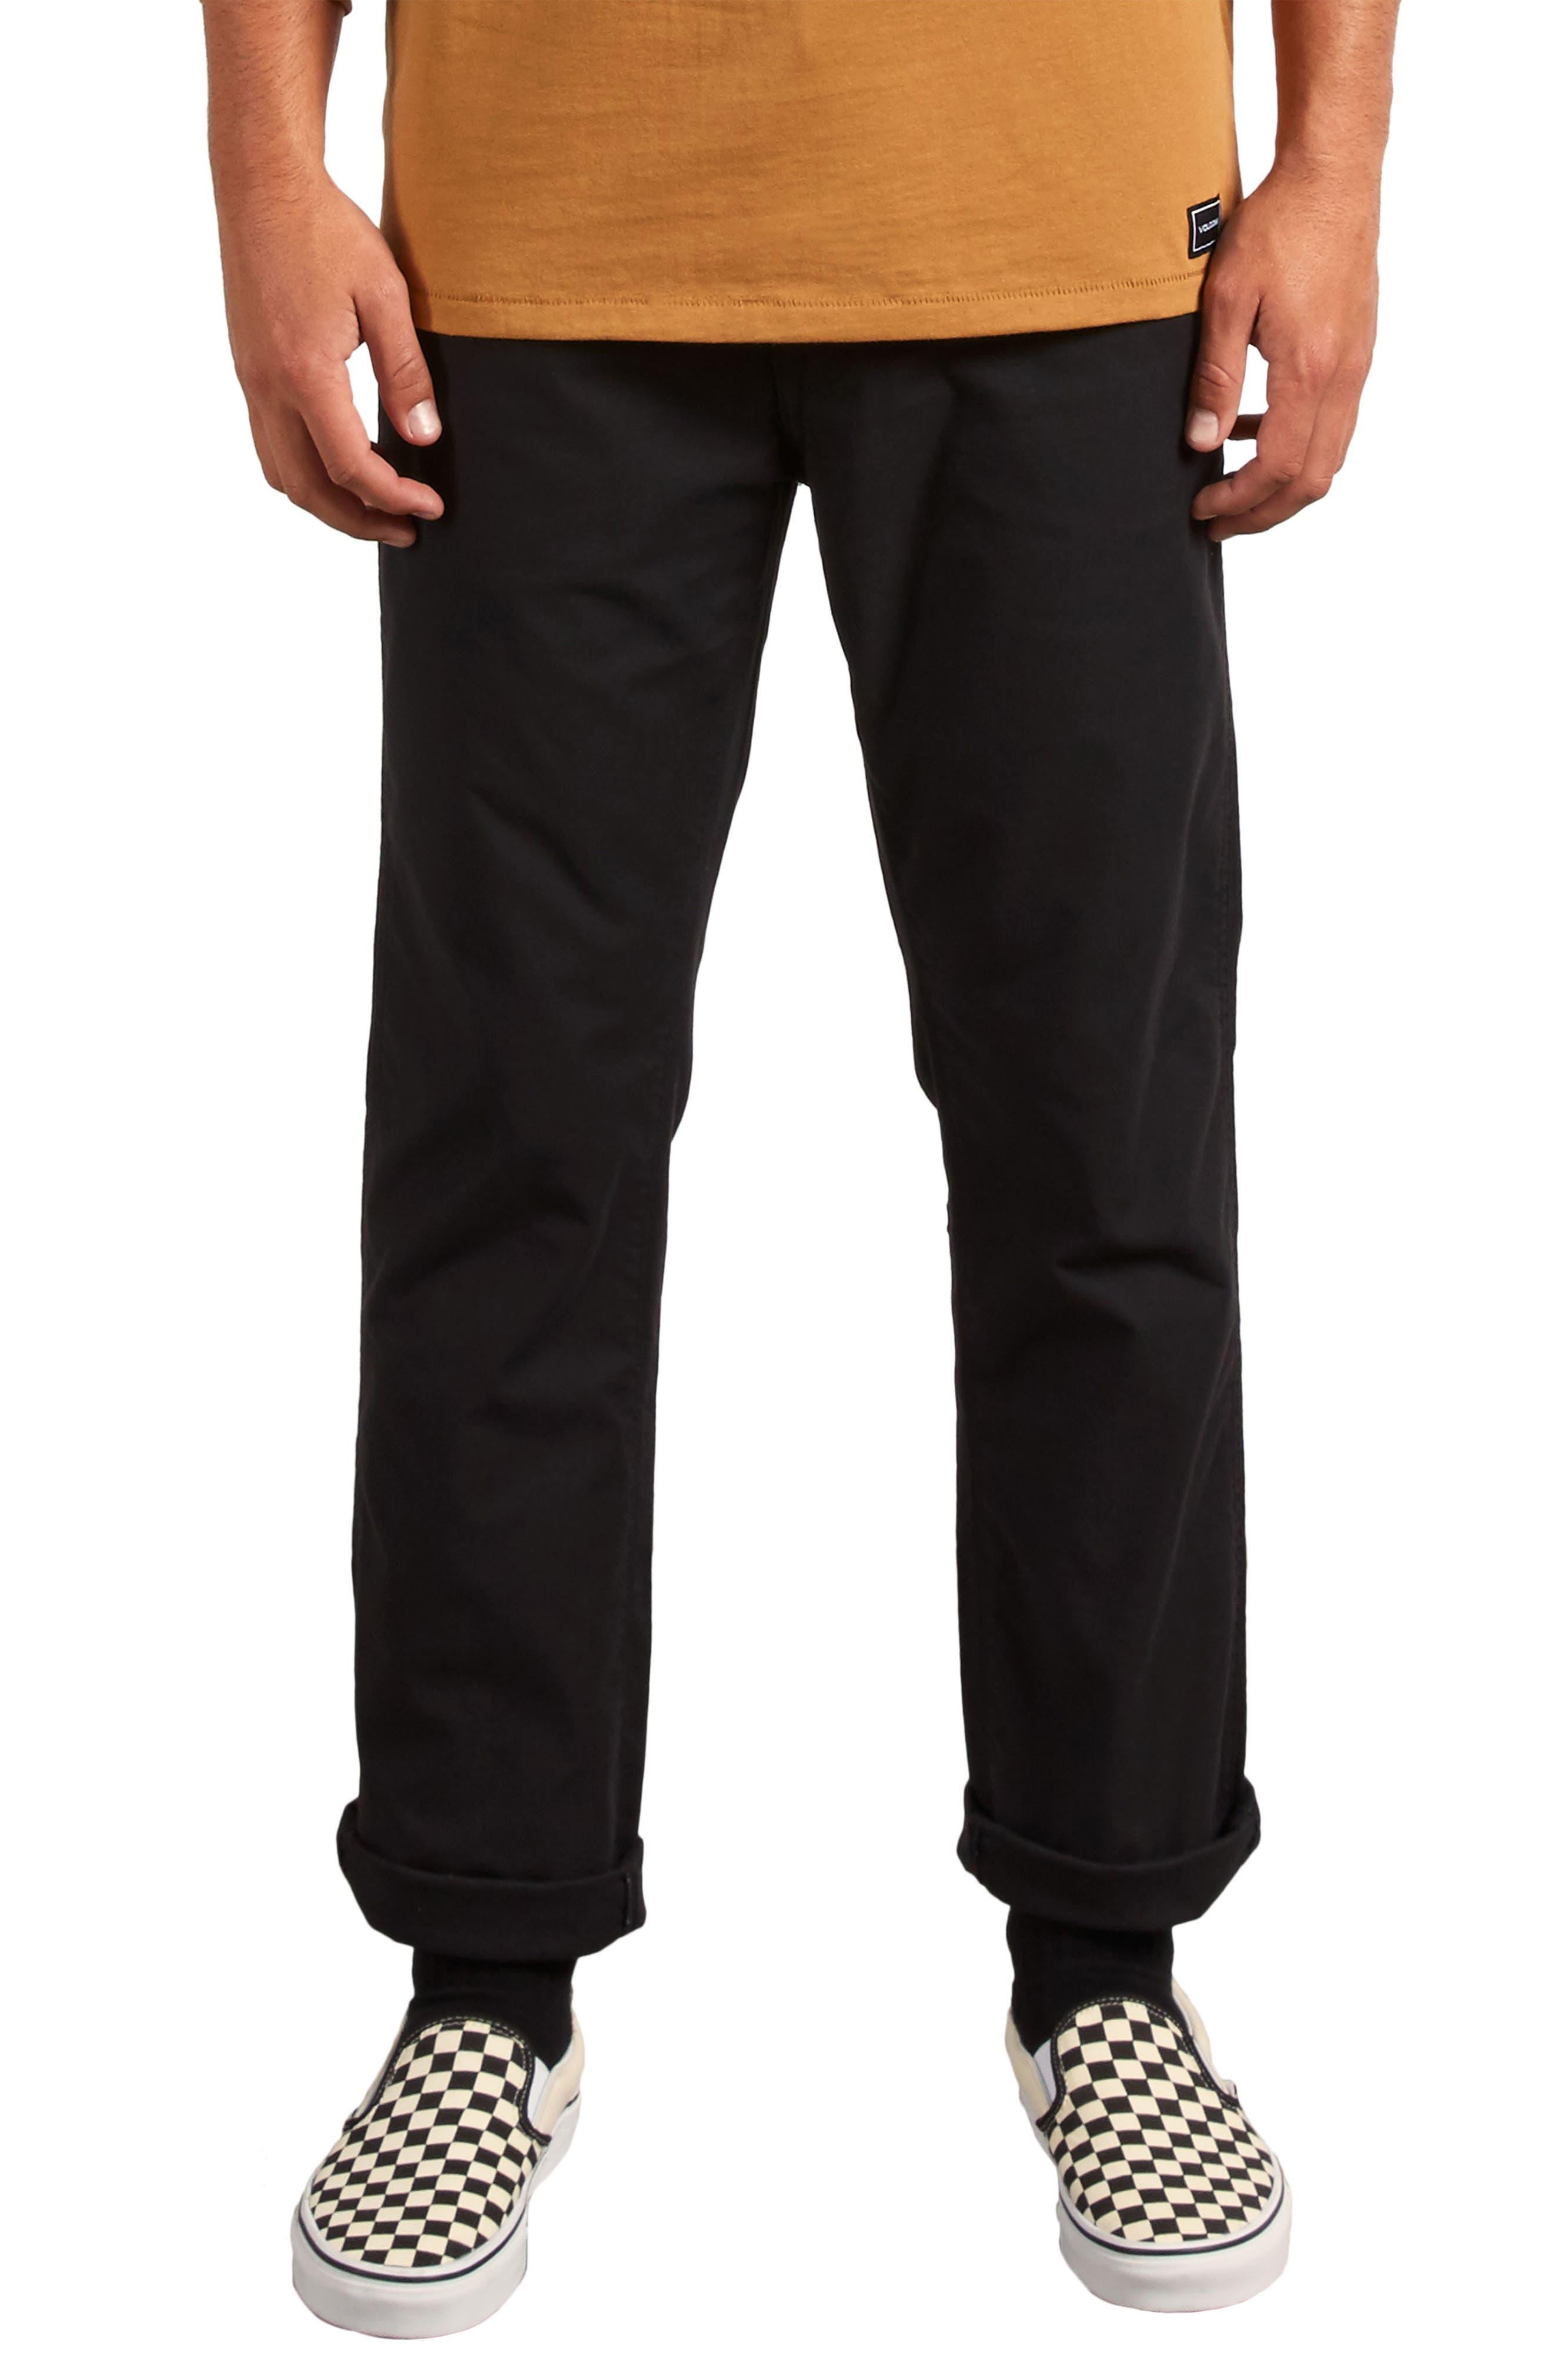 Gritter Modern Fit Straight Leg Chino Pants,                             Main thumbnail 1, color,                             BLACK